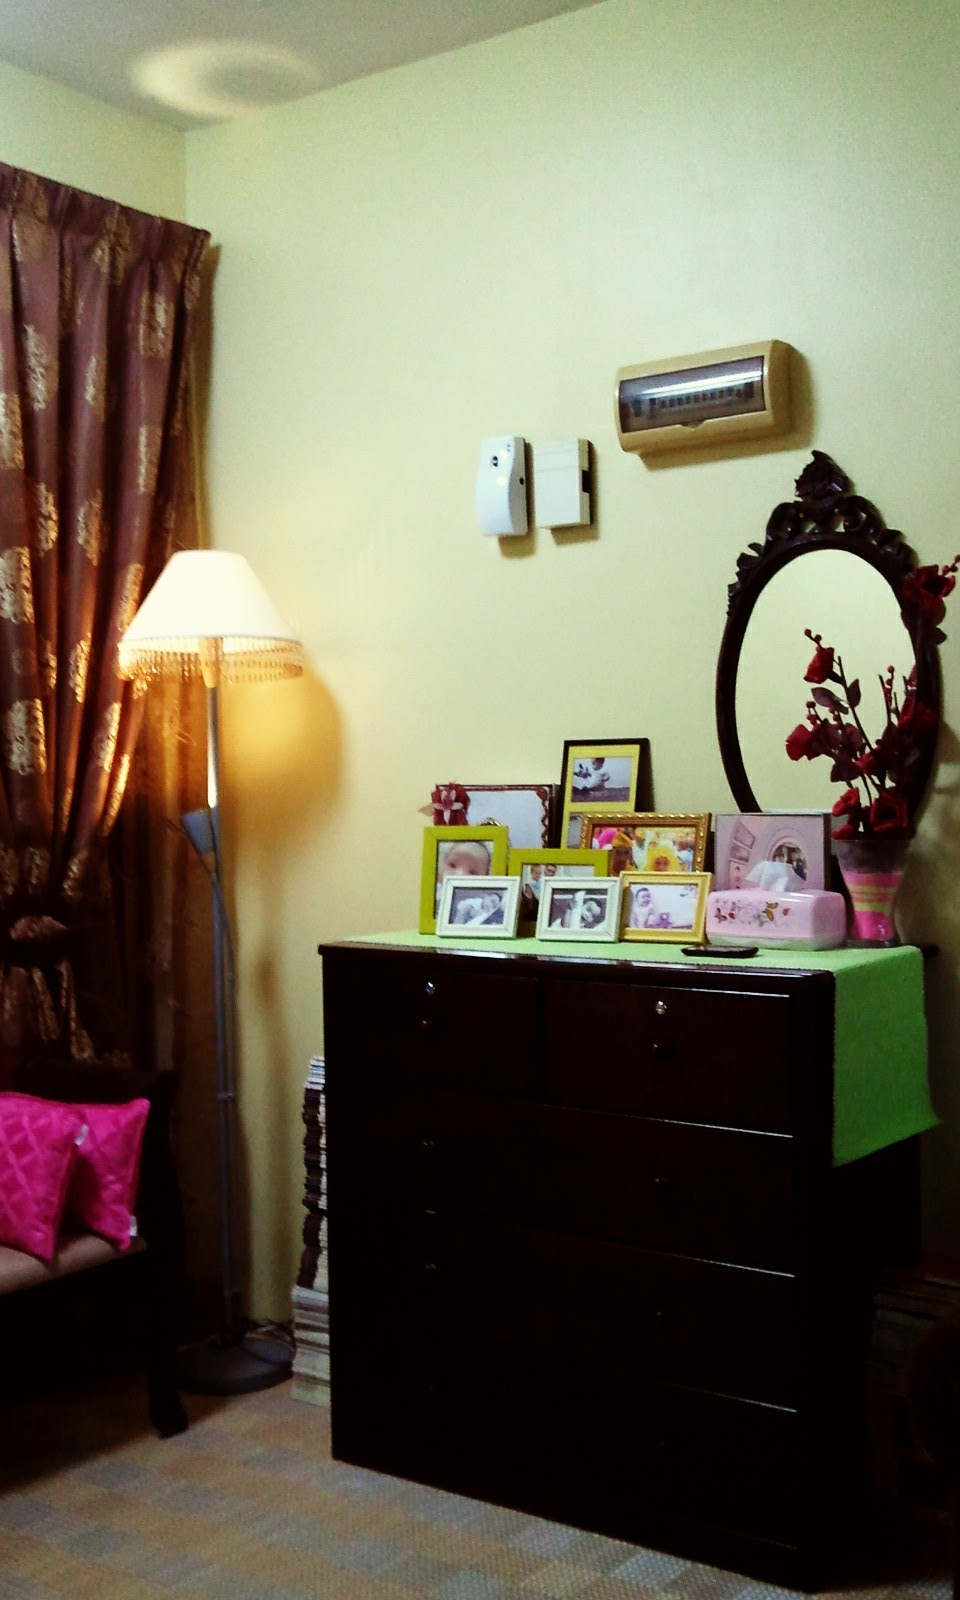 deko raya ruang tamu 2012 ::